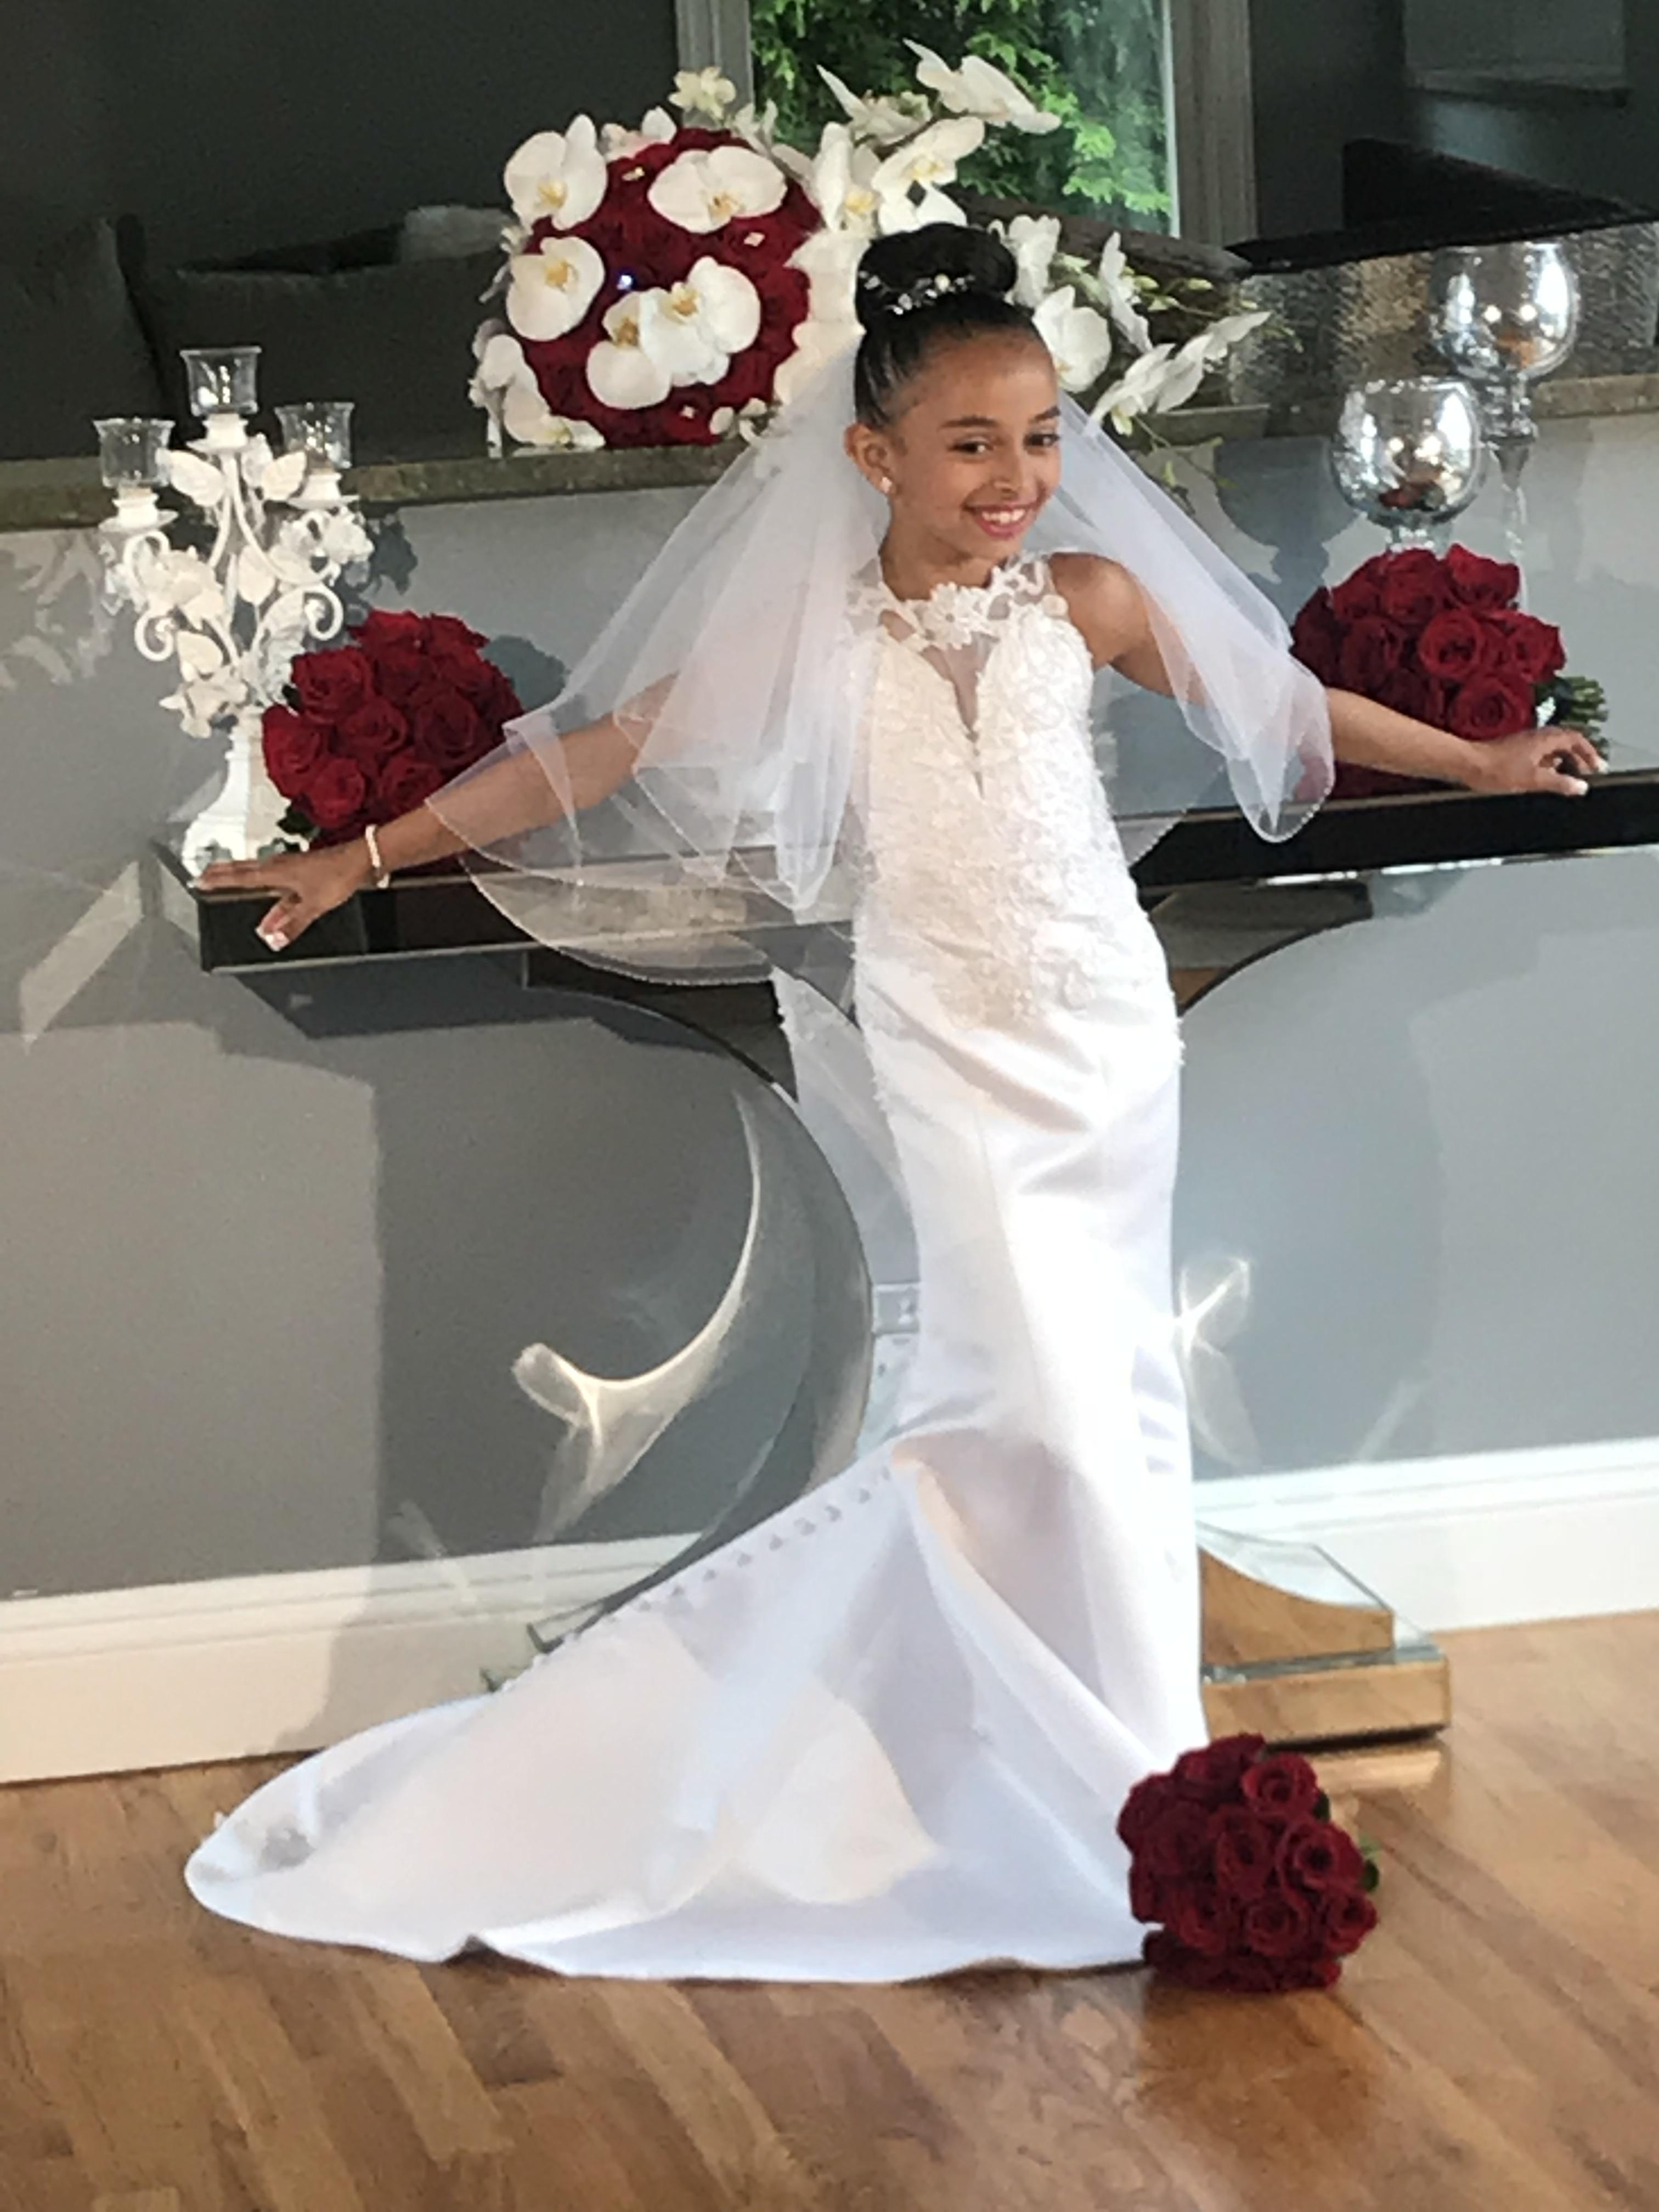 04985ddbea2 Flower girl dresses made to match the brides wedding dress.